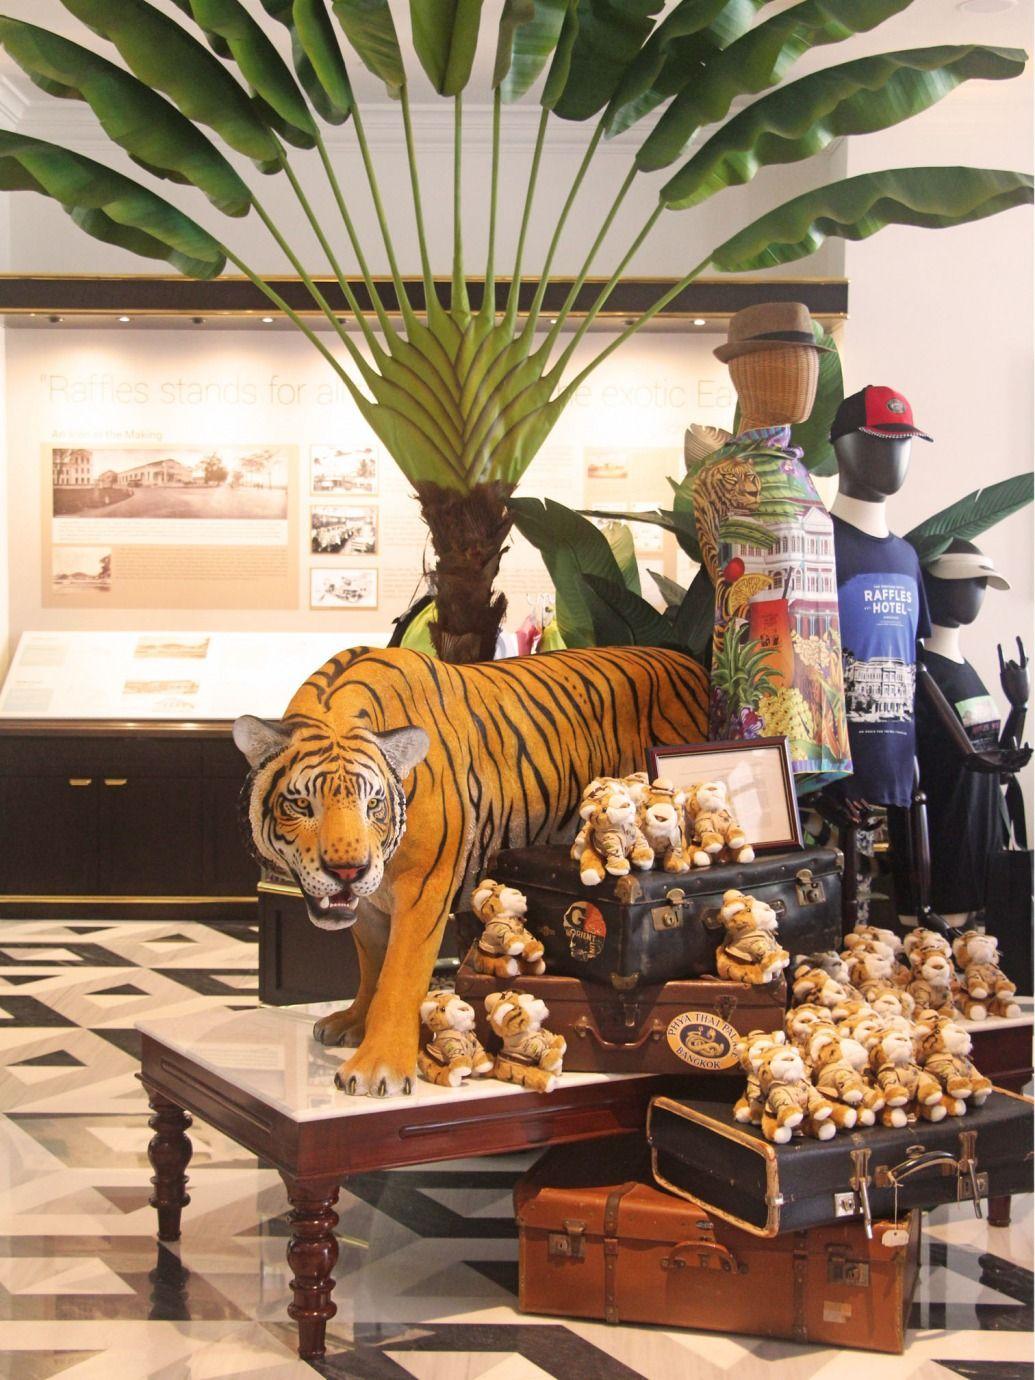 Proud Associate of Raffles Hotel - Raffles Boutique1 l The Past Perfect Collection l Singapore